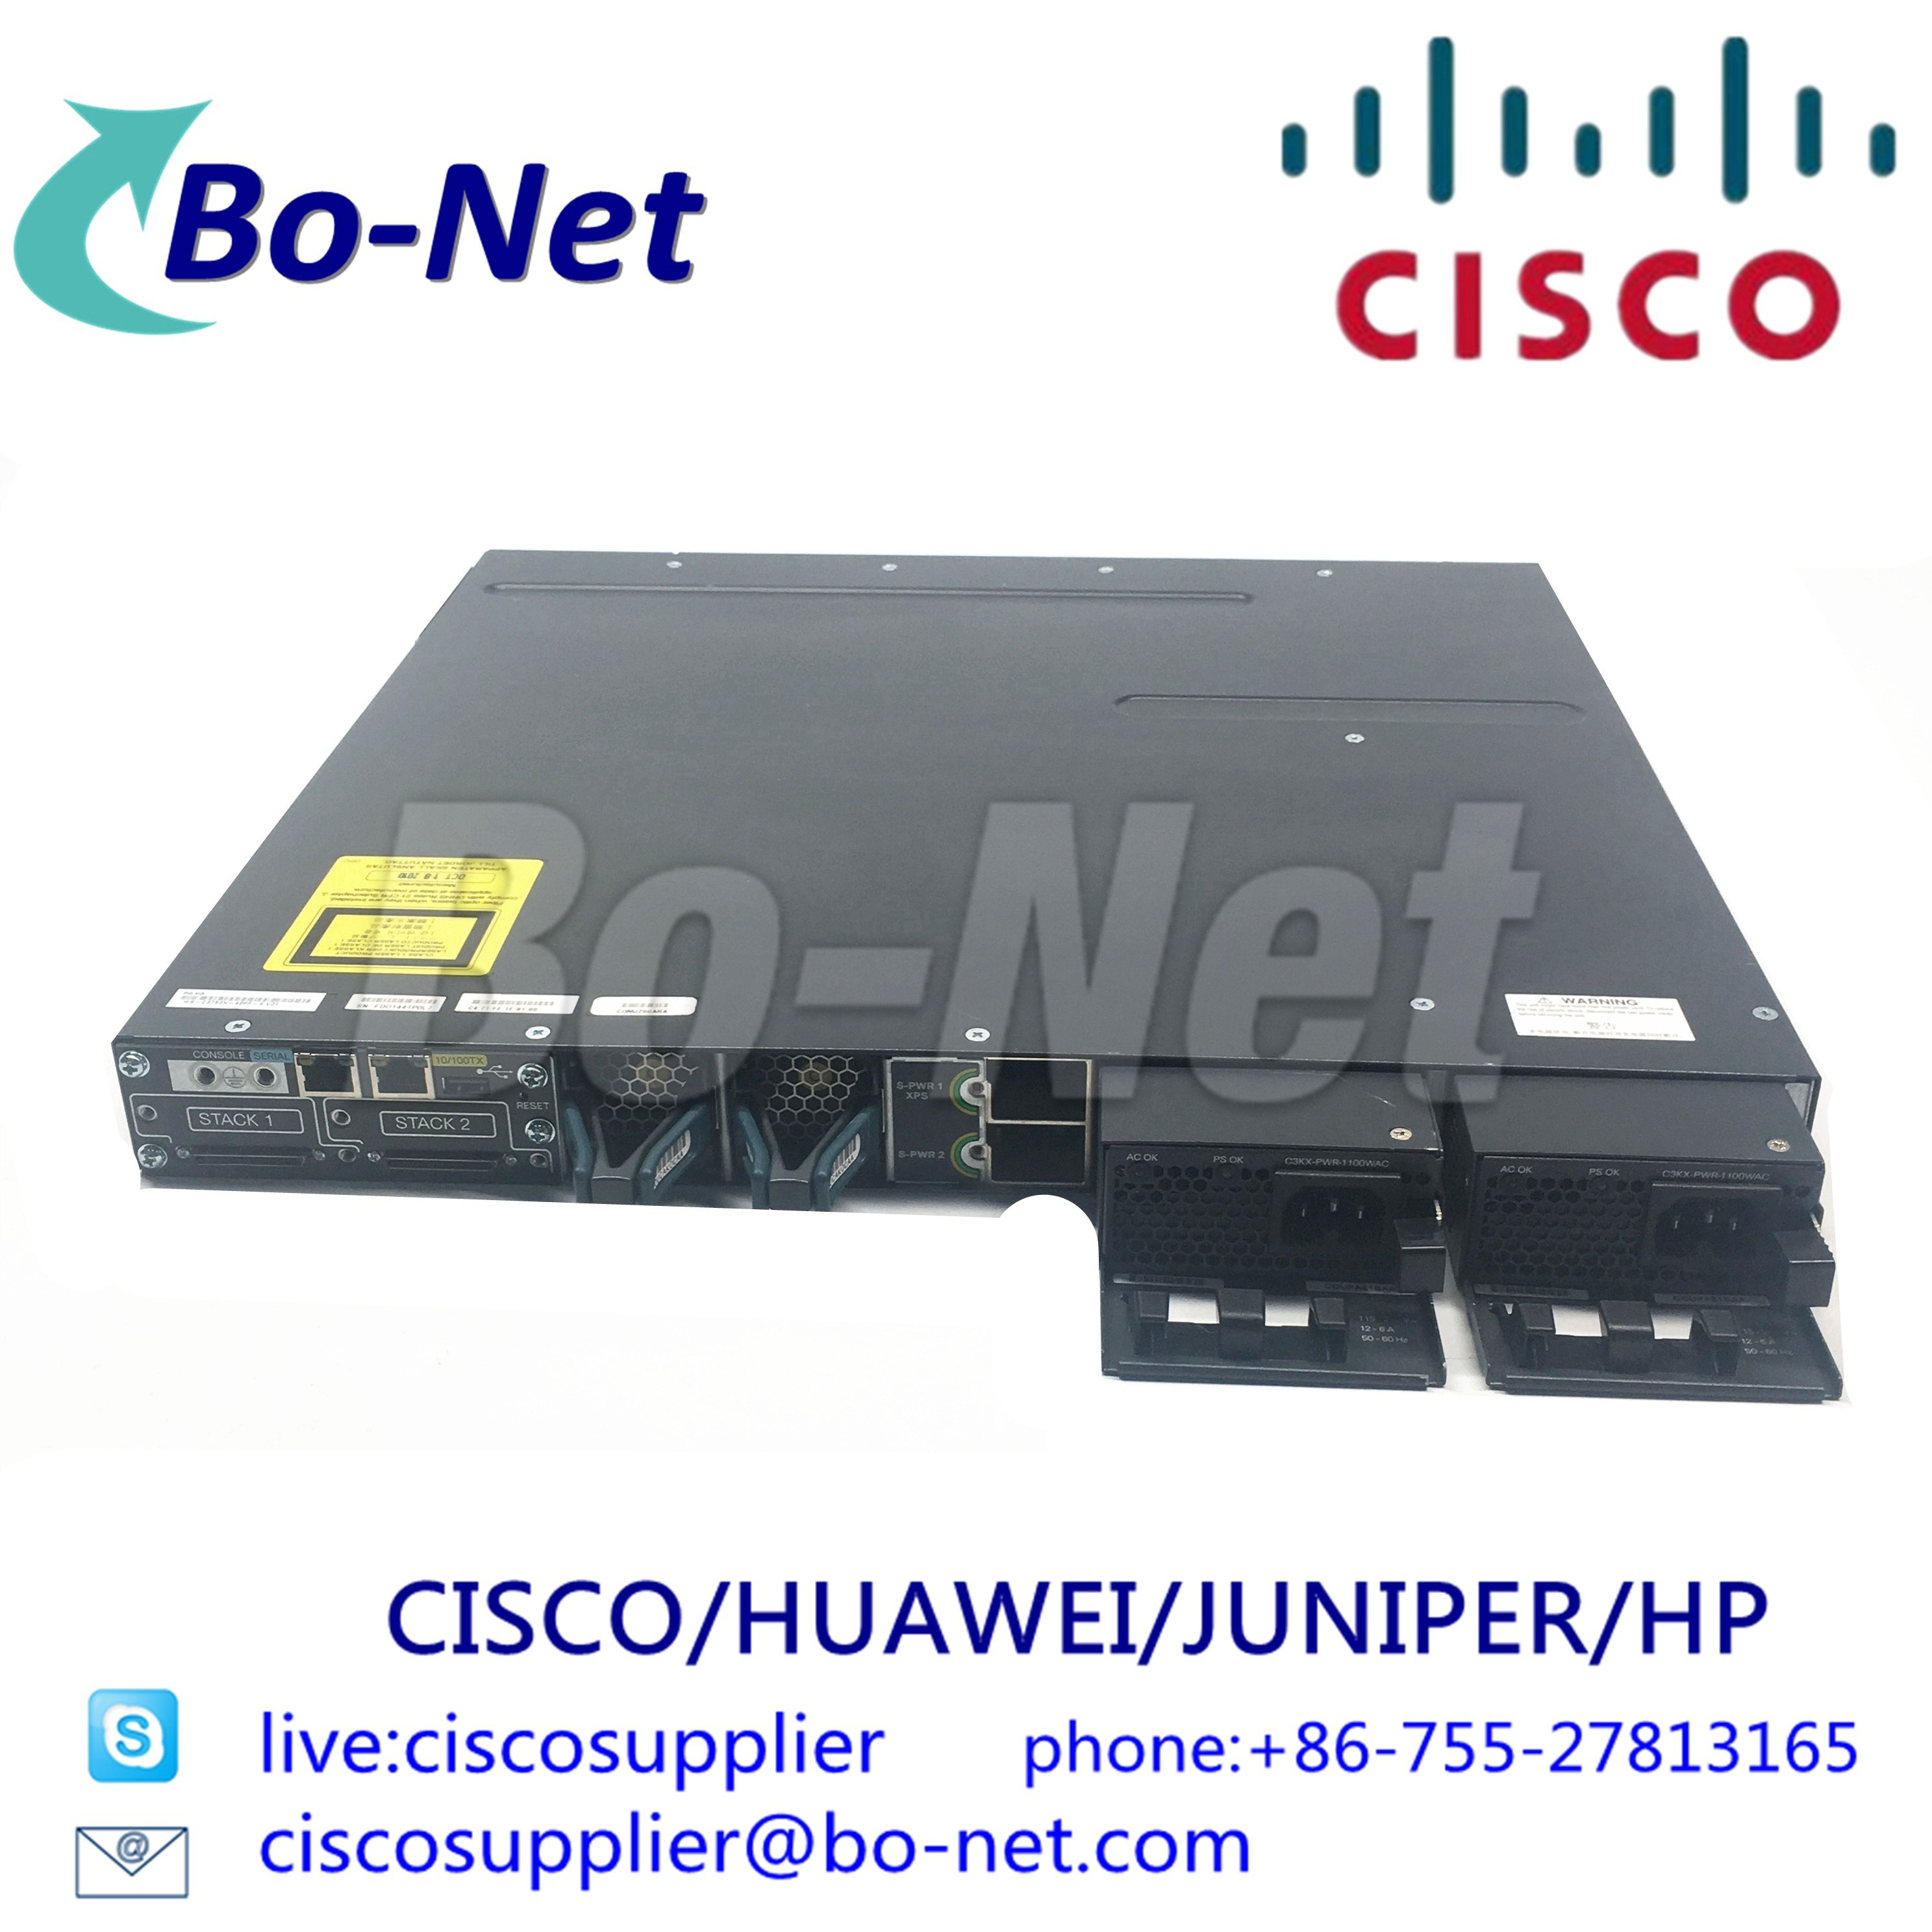 CISCO WS-C3750X-48PF-S network switches Cisco select partner BO-NET